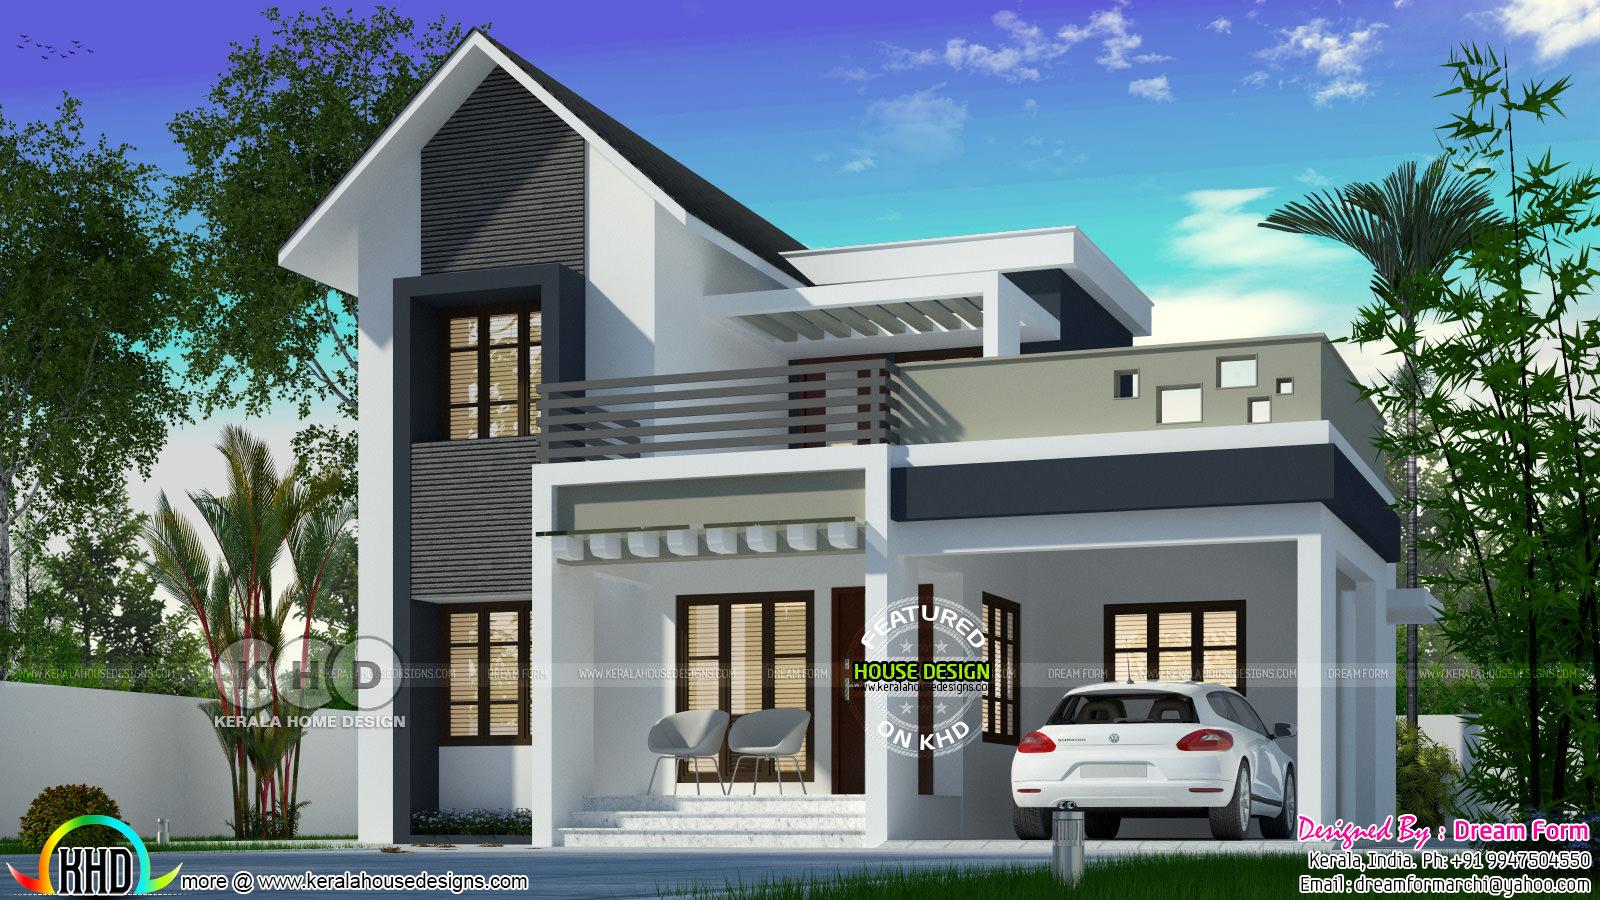 Cute 1630 Square Feet Mixed Roof Home Design Kerala Home Design